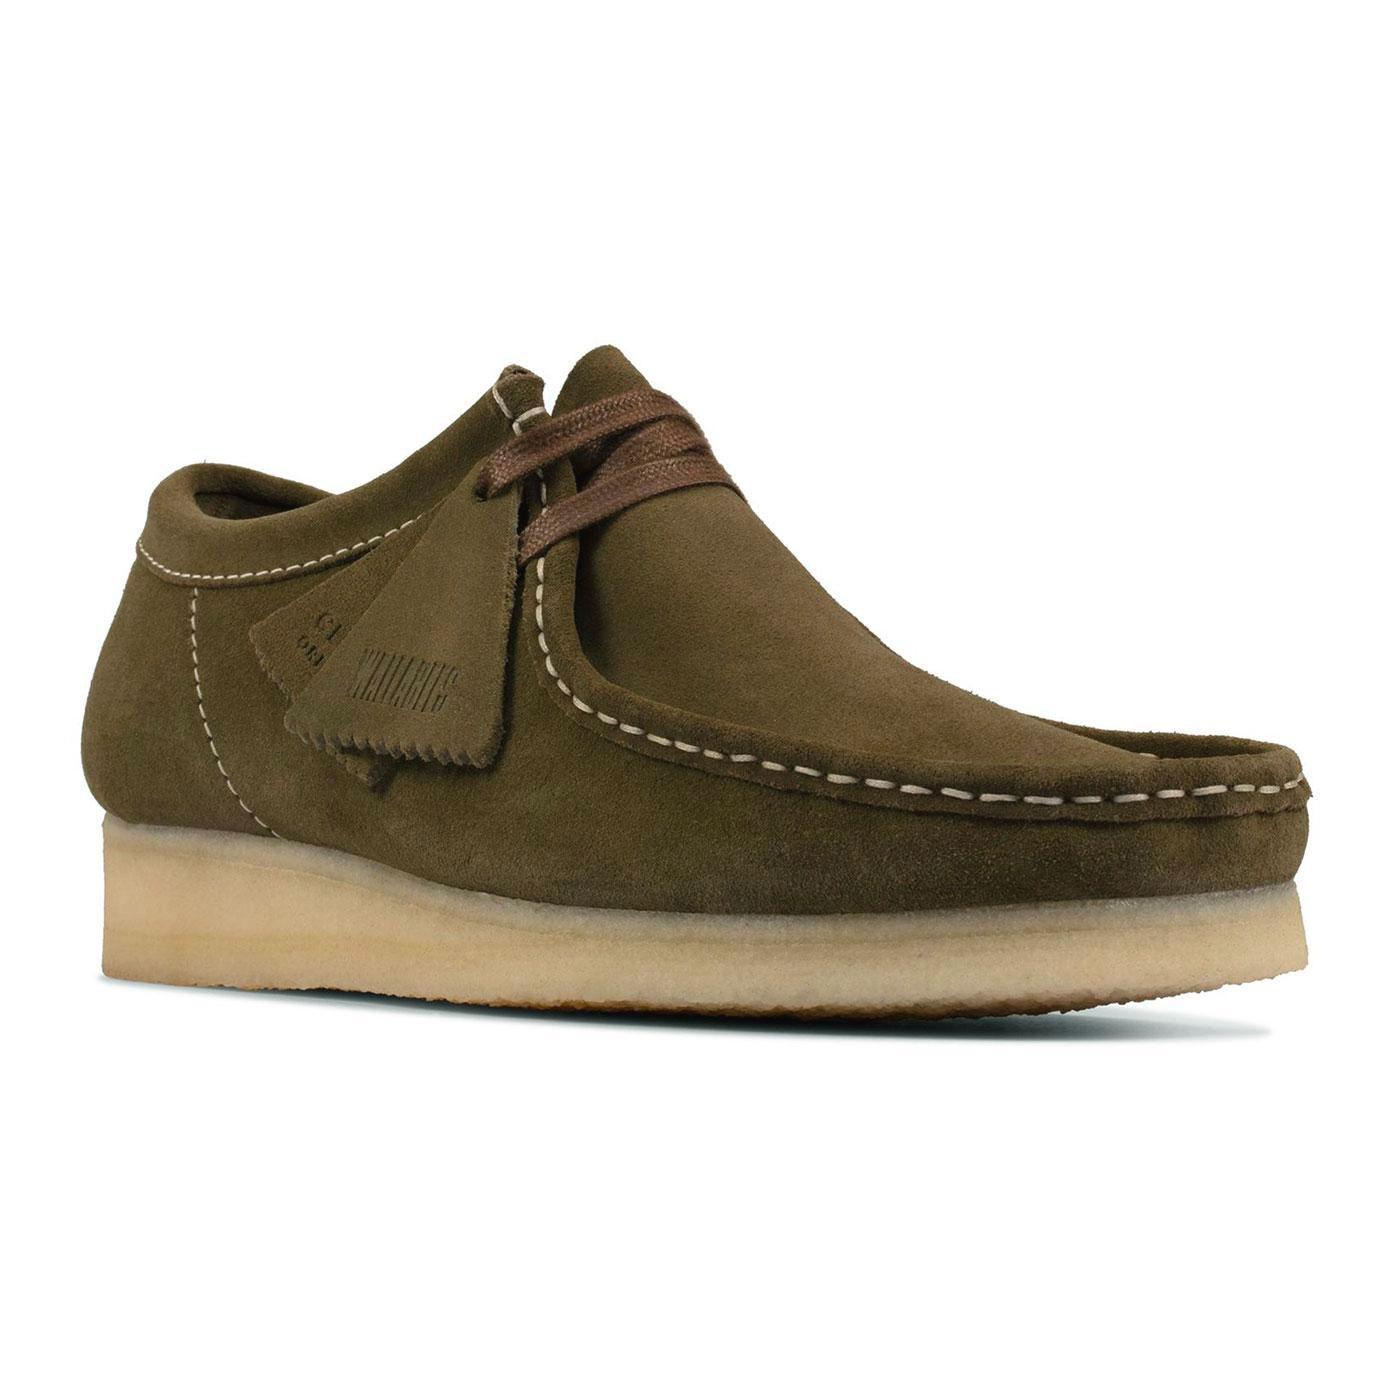 Wallabee CLARKS ORIGINALS Mod Suede Shoes (Khaki)